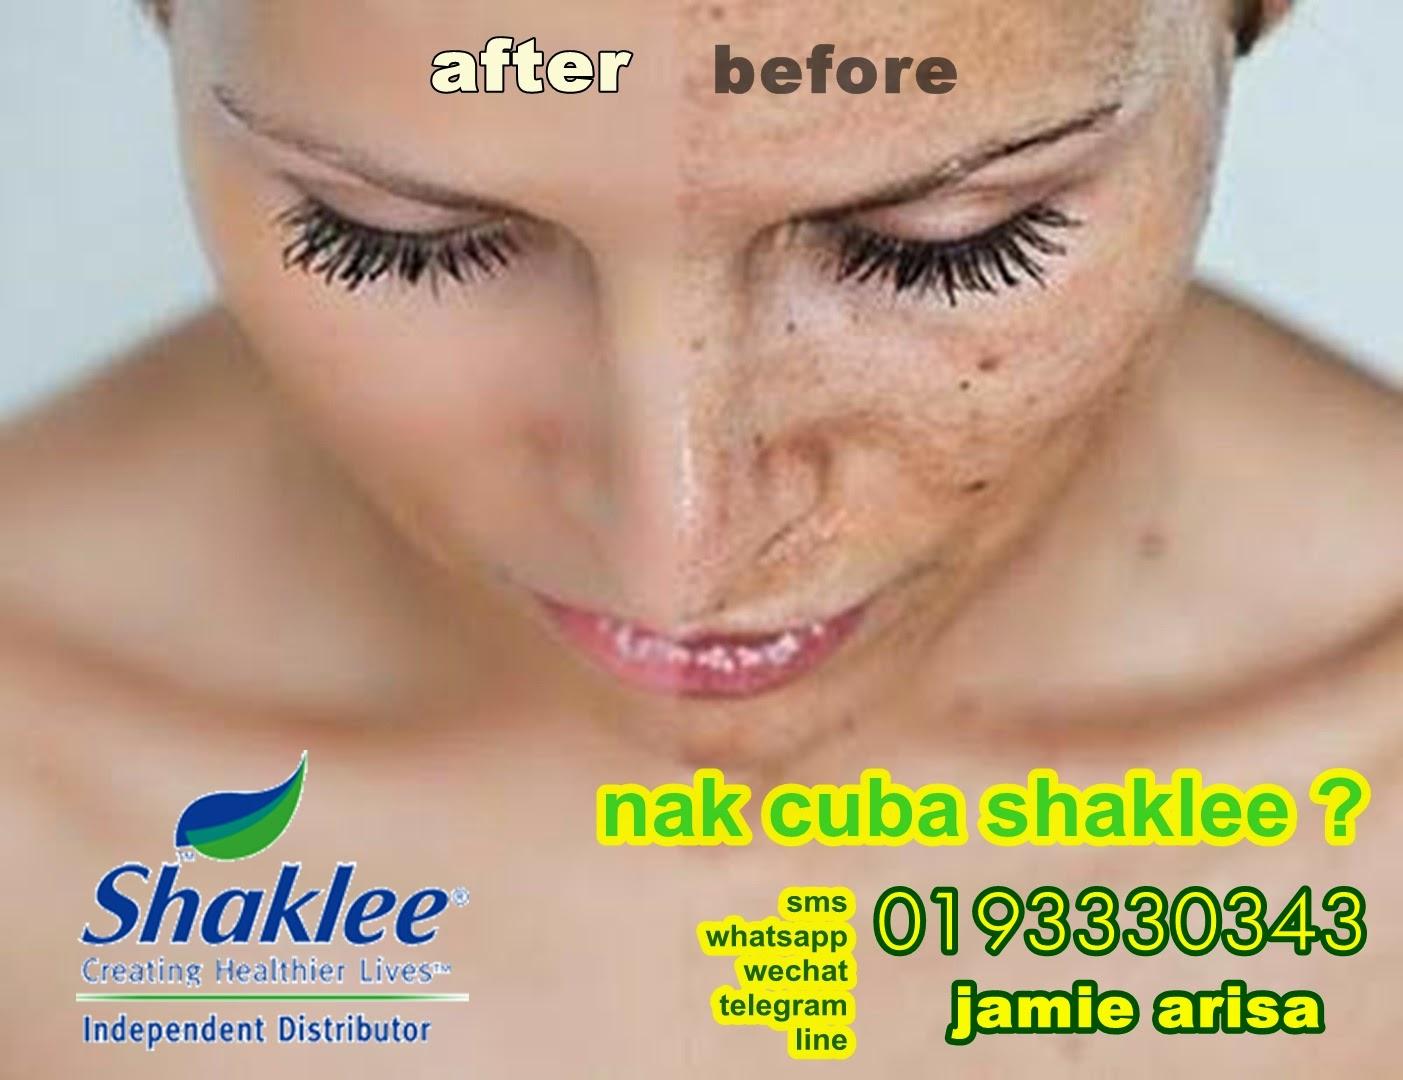 Hubungi Puan Jamie Arisa di 0193330343 untuk set Shaklee untuk hilangkan jeragat dan set-set vitamin lain yang dapat menolong mencantikkan kulit anda